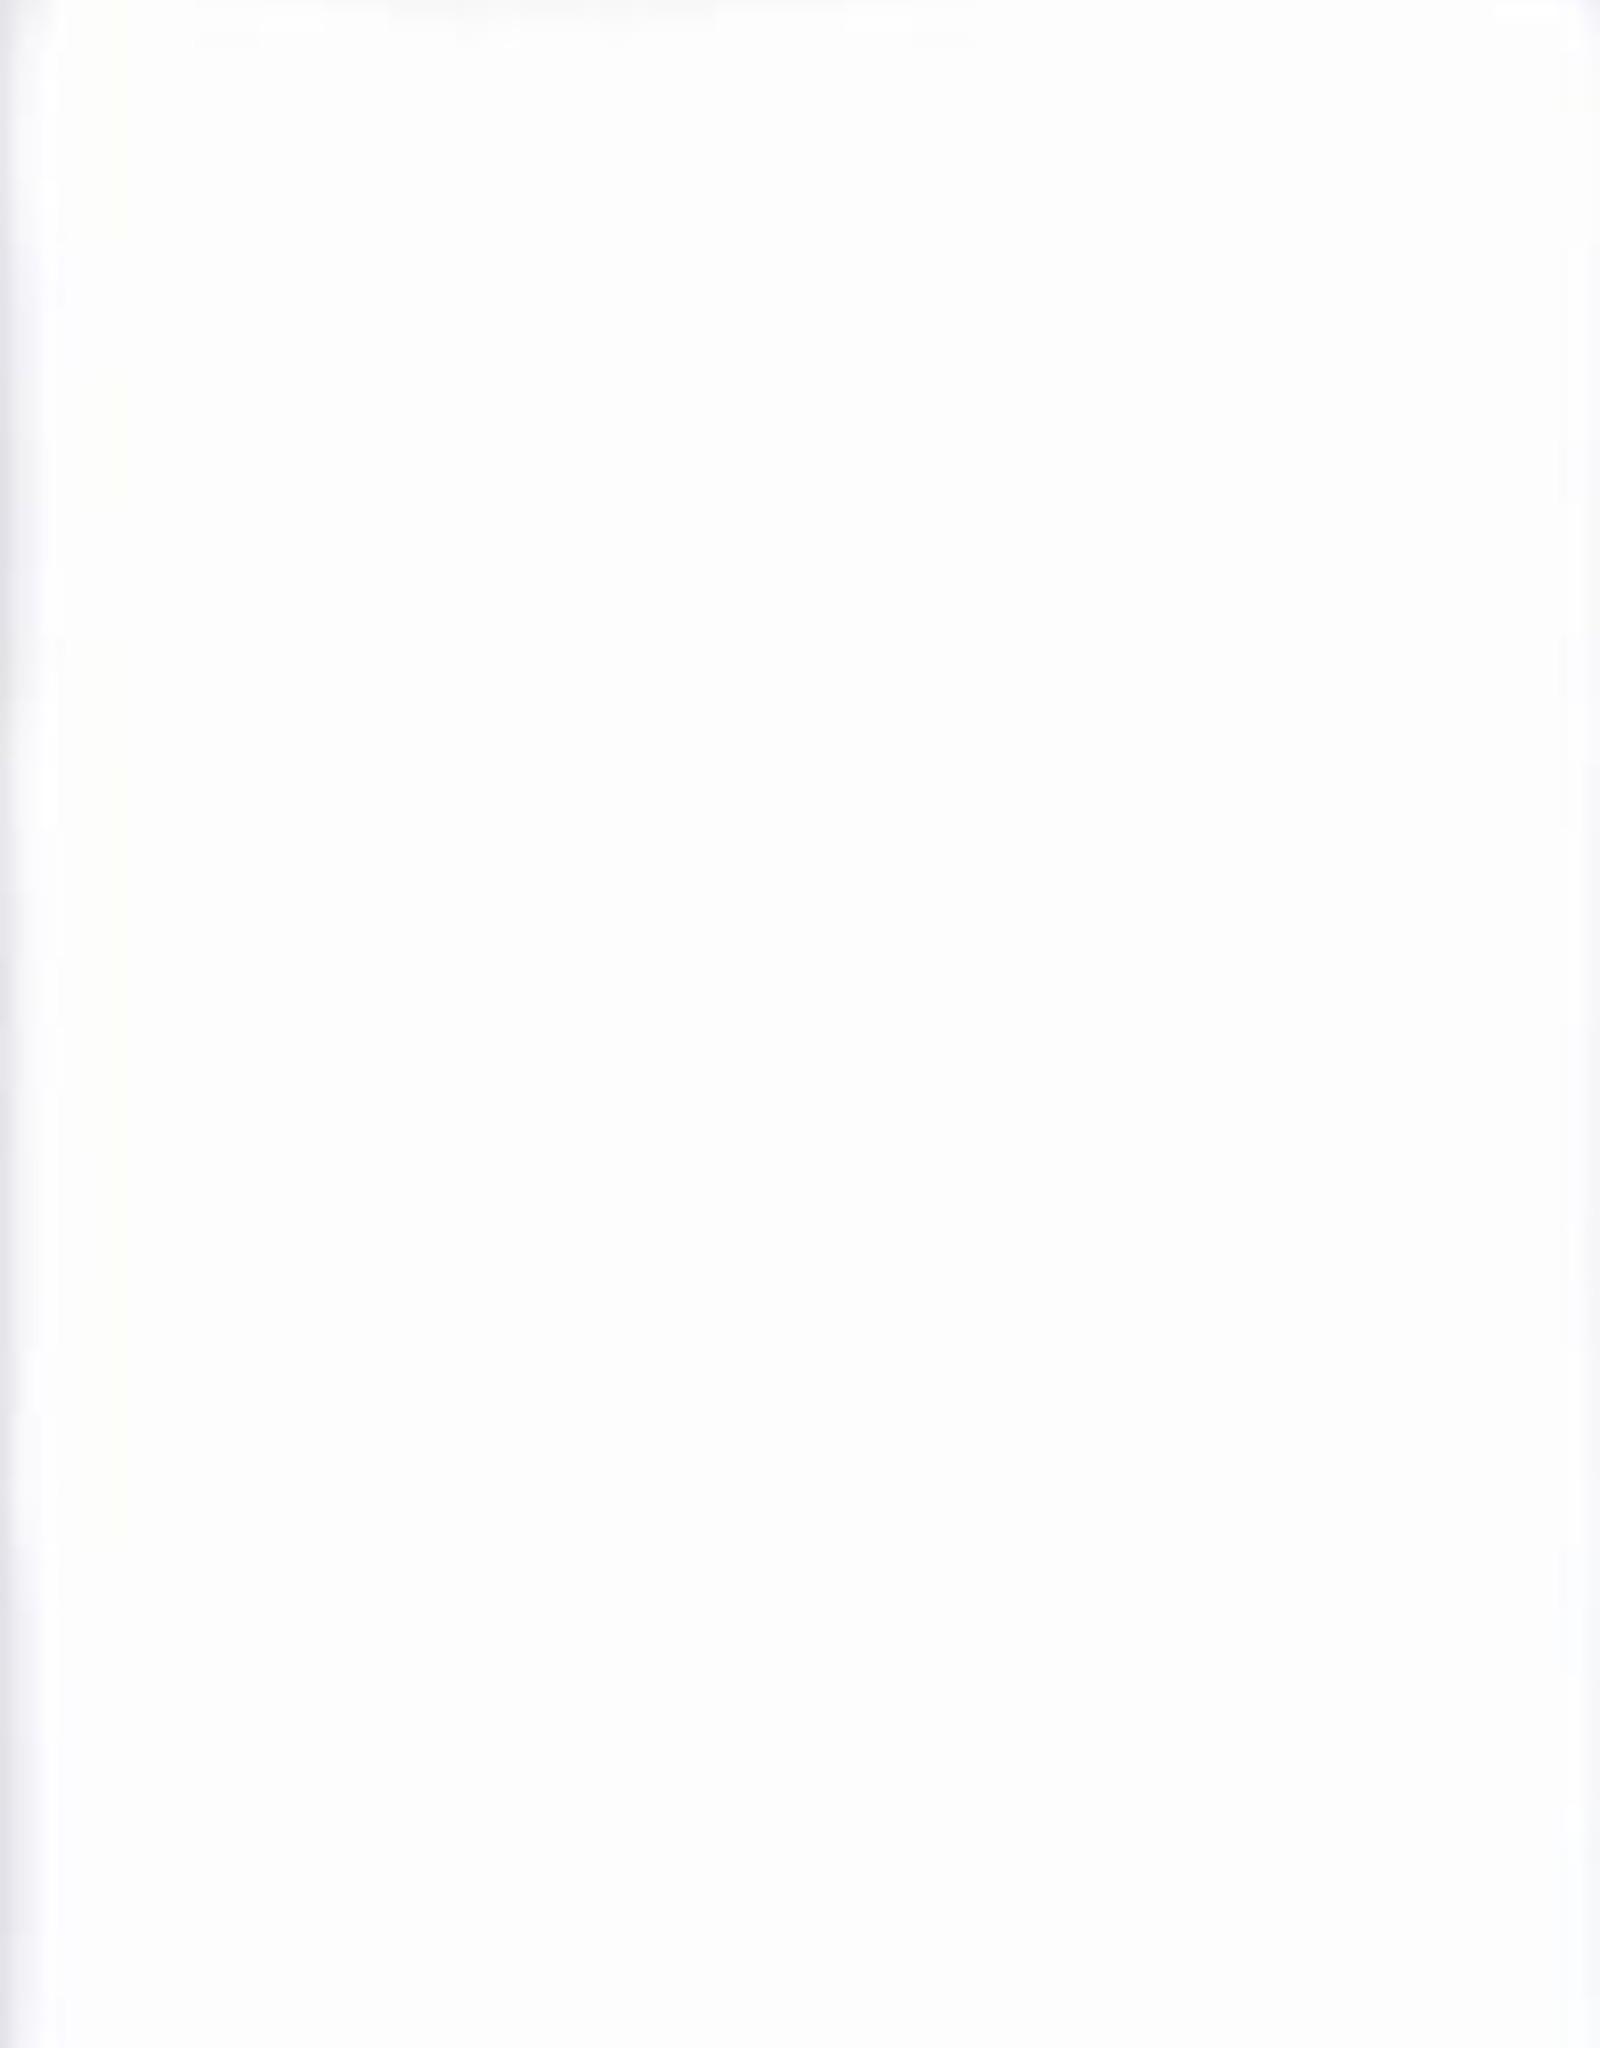 "Yupo, White, 58# Cover, 20"" x 26"", 158gsm"